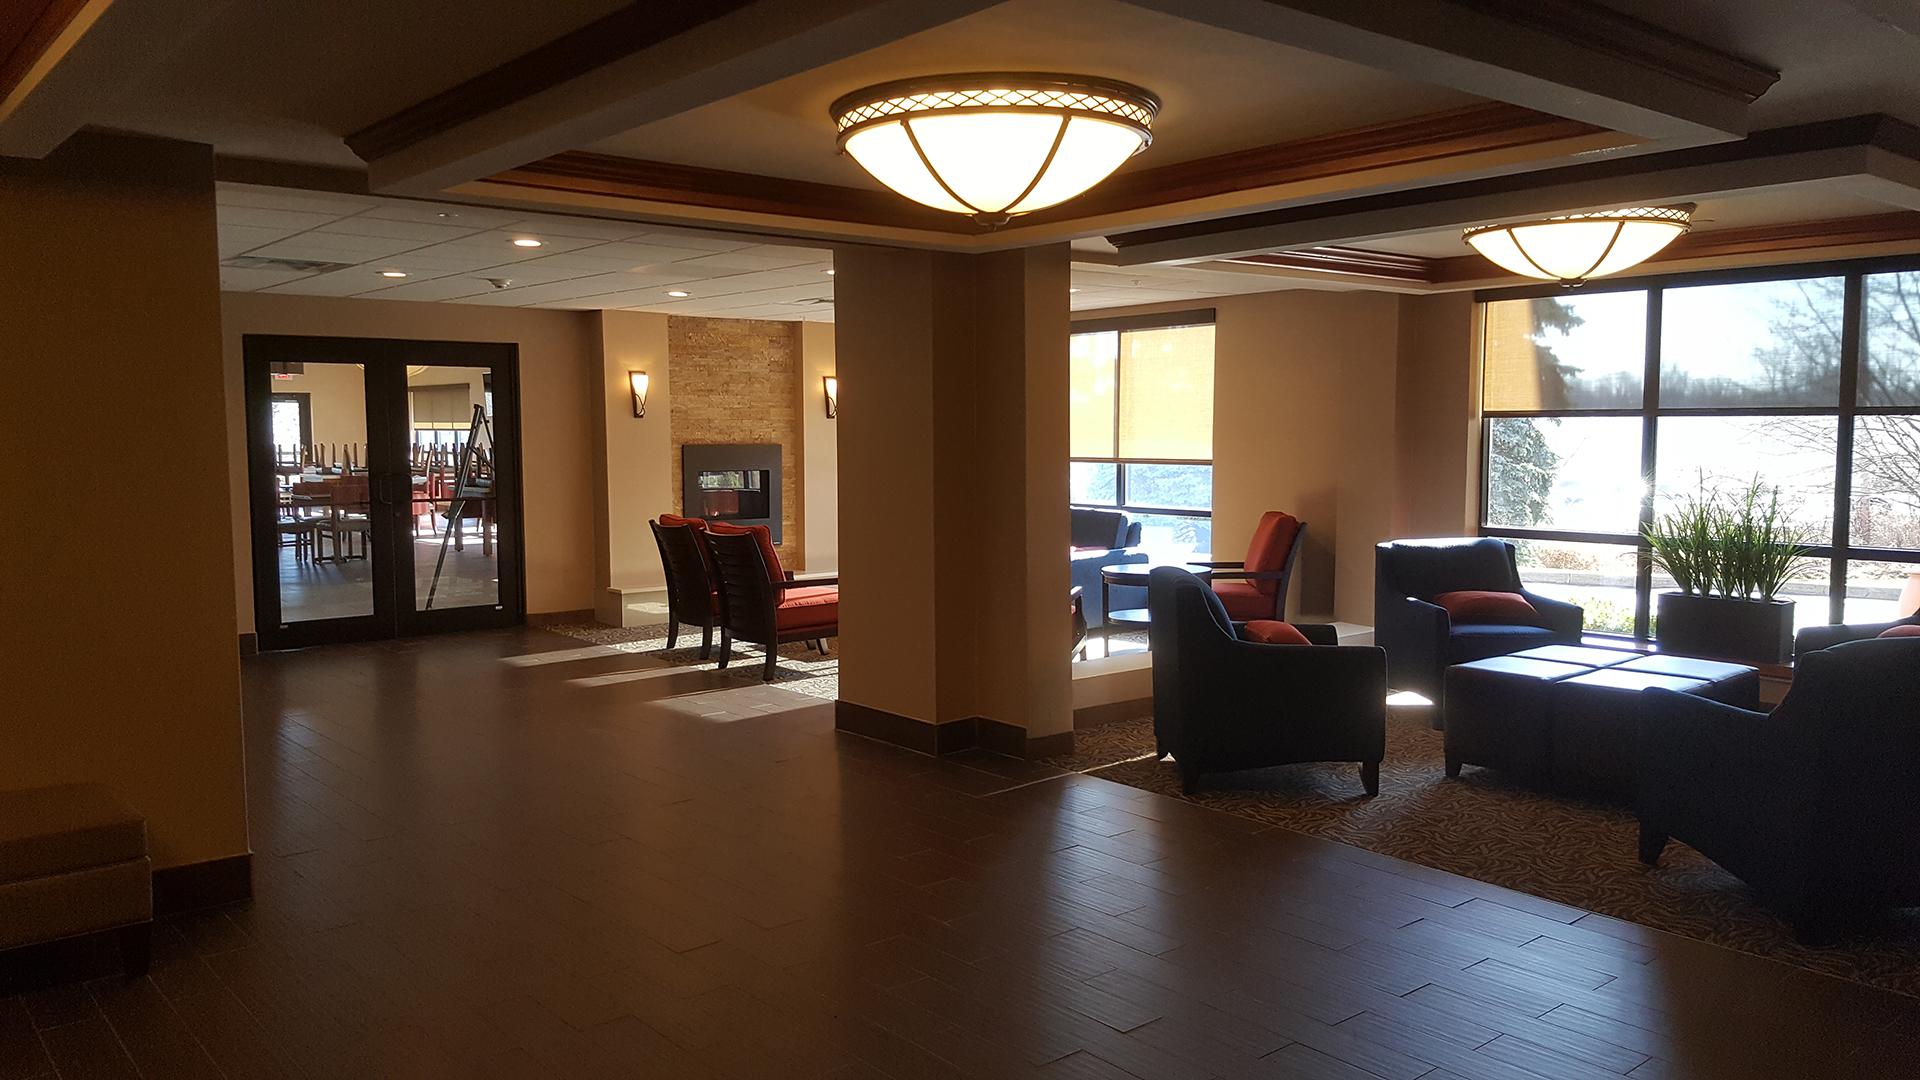 Lobby, view 3, Comfort Inn